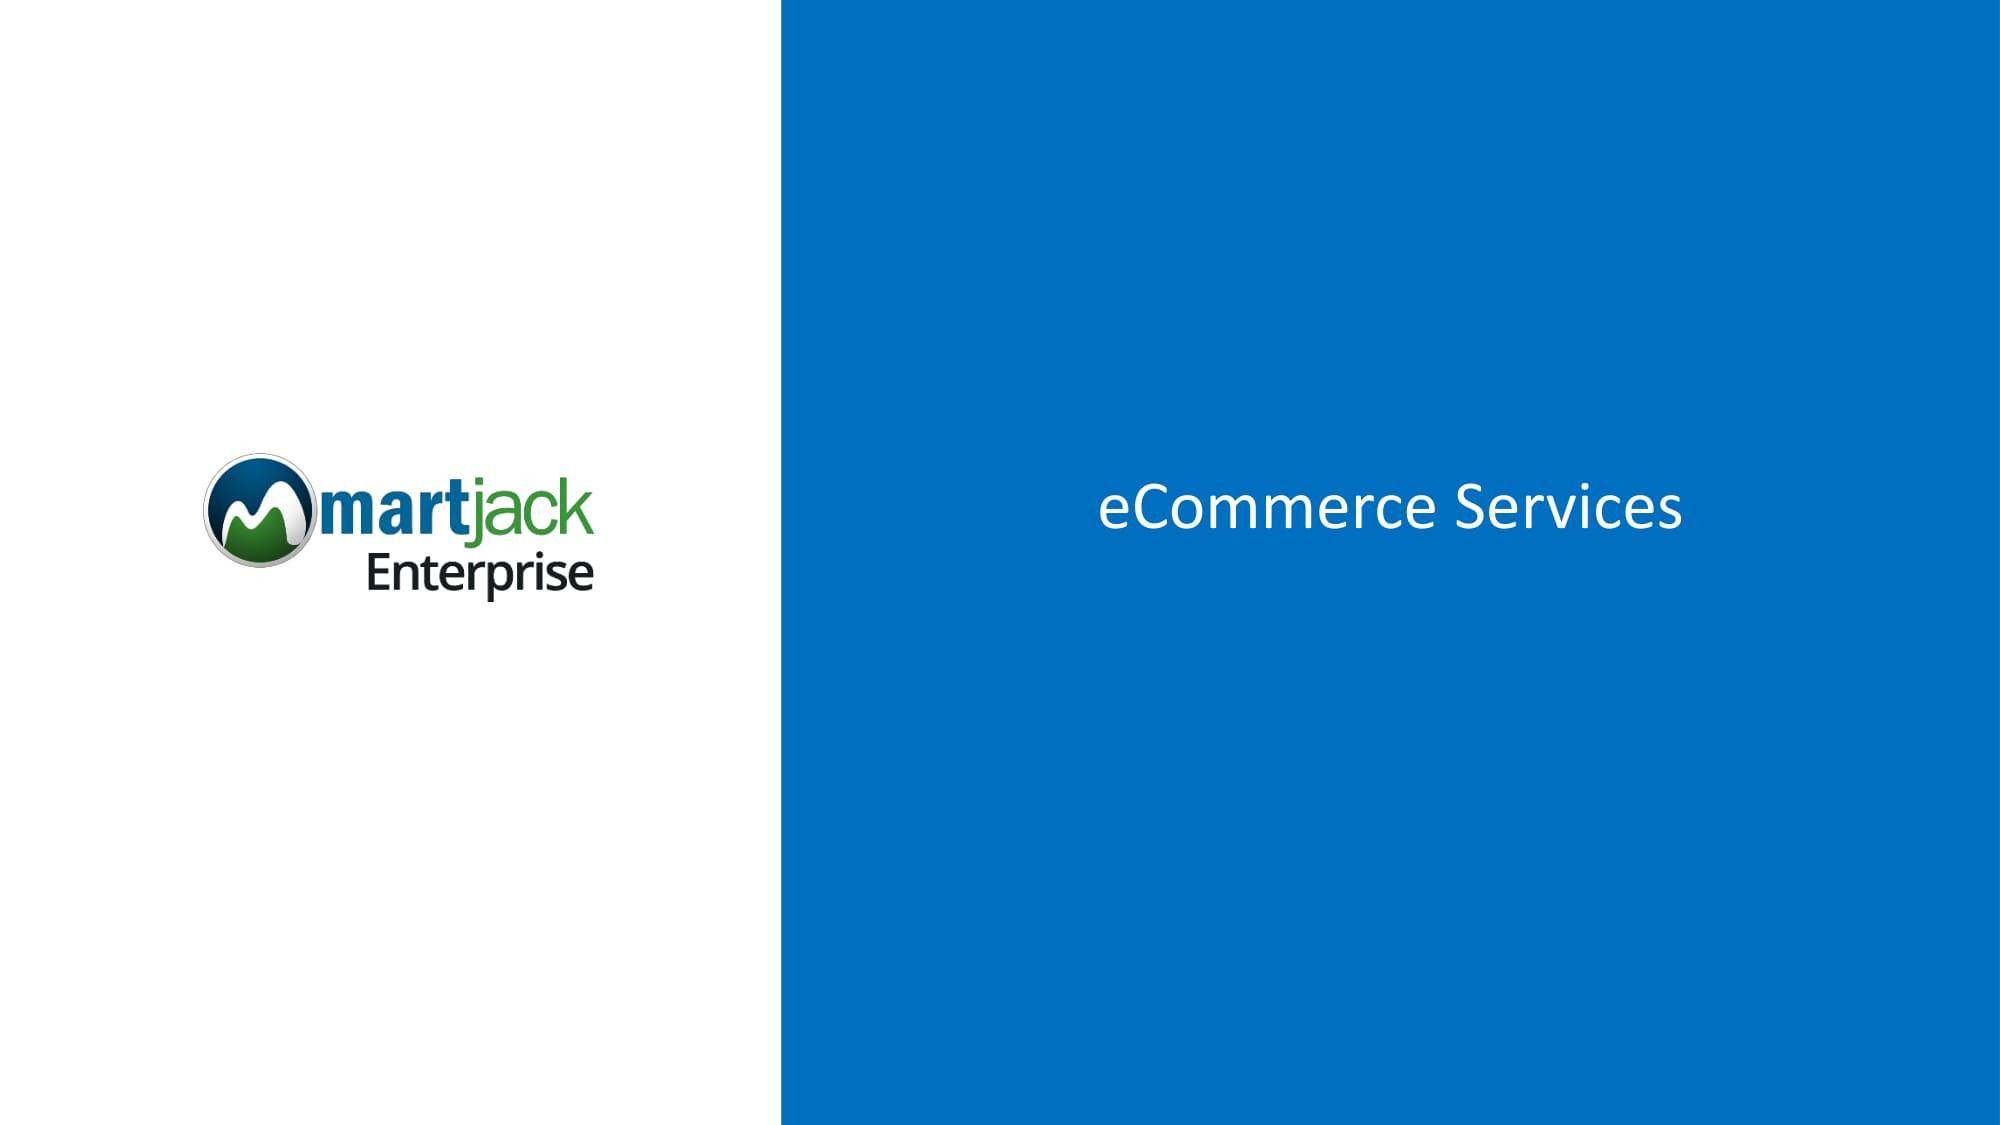 martjack_corporate_and_platform_overview-20